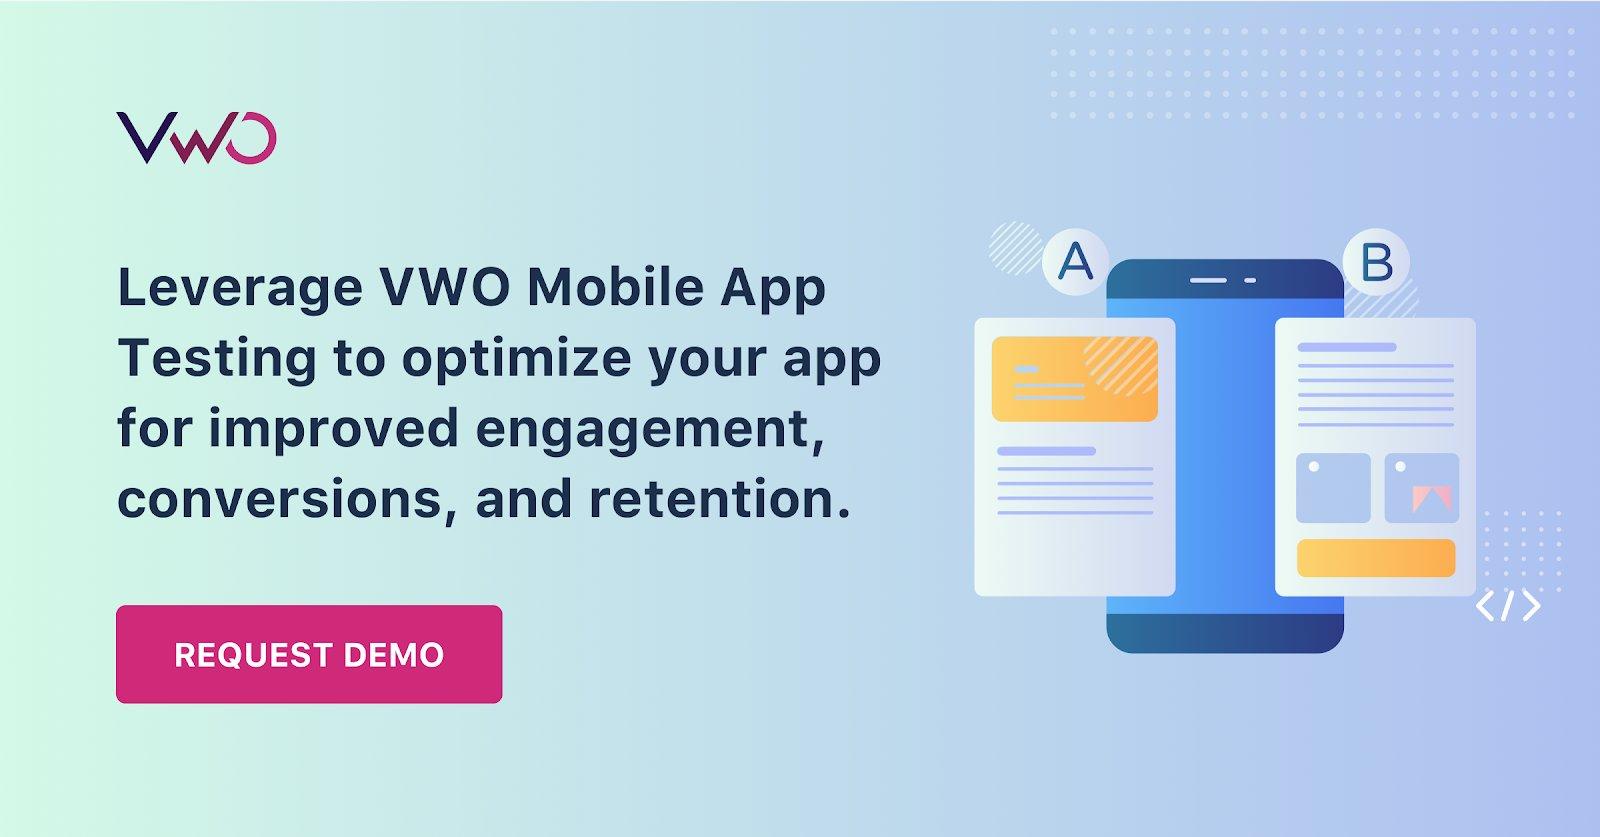 VWO Mobile App testing